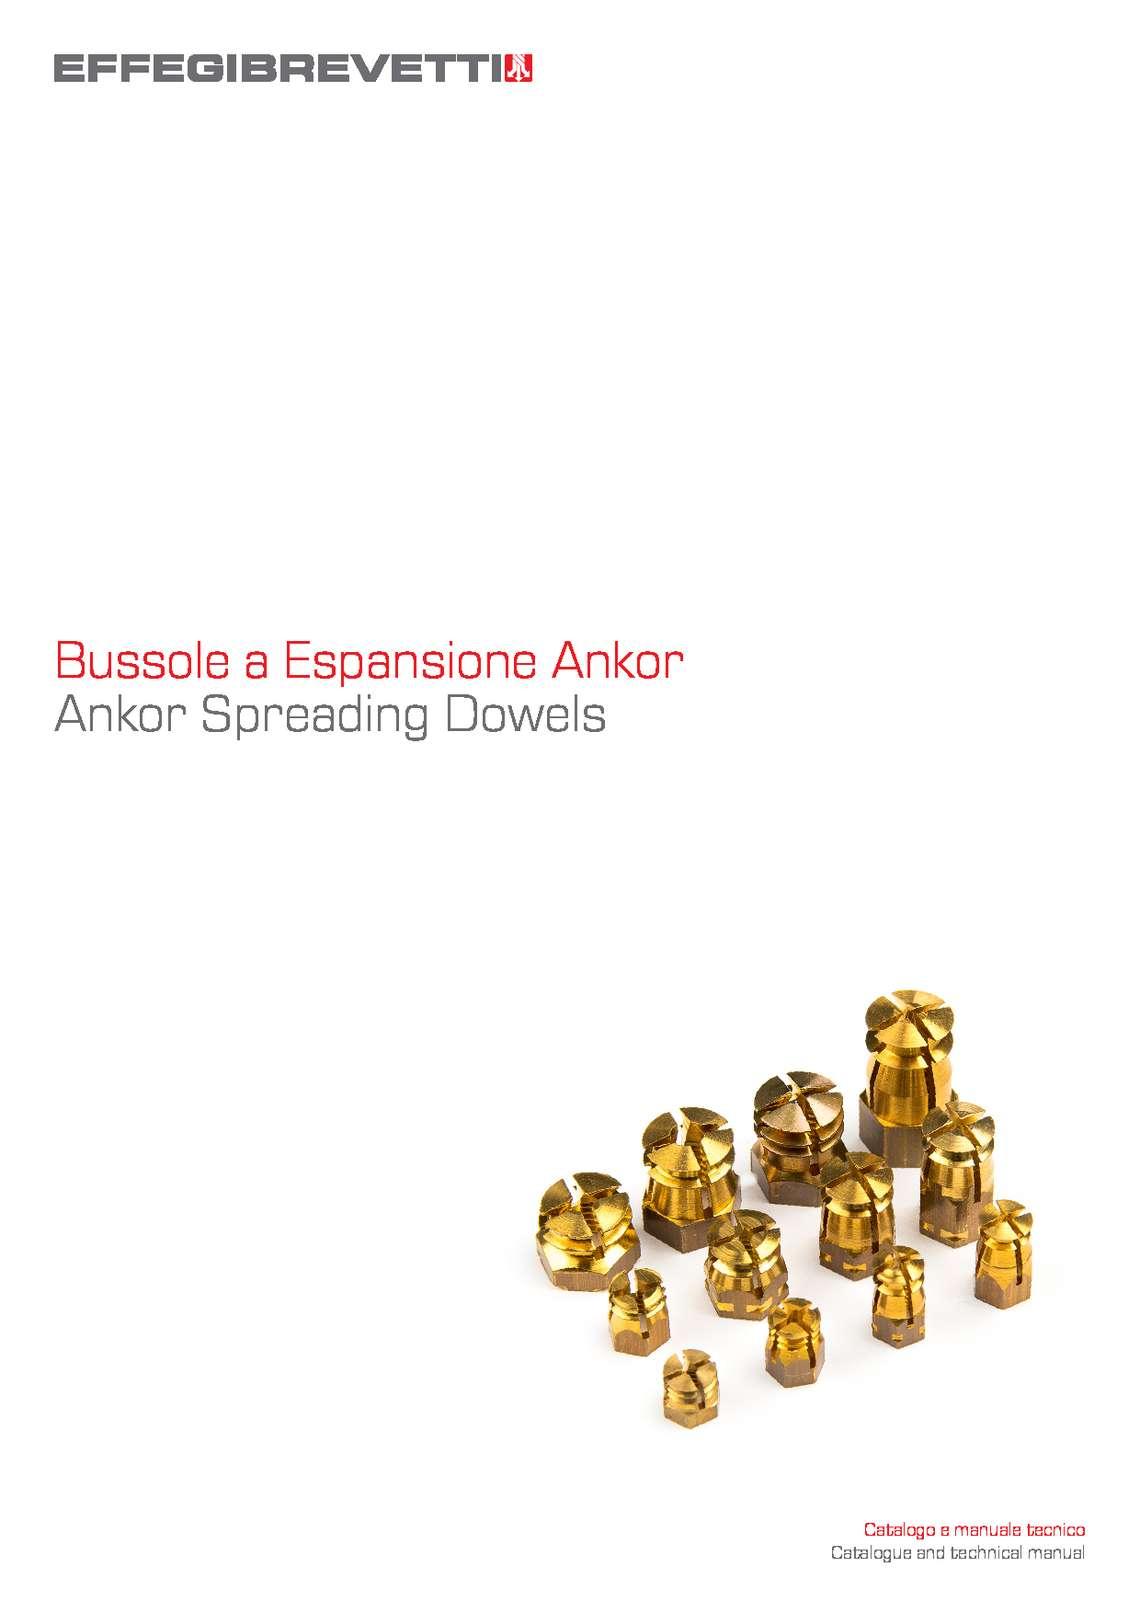 Bussole a Espansione Ankor Effegibrevetti